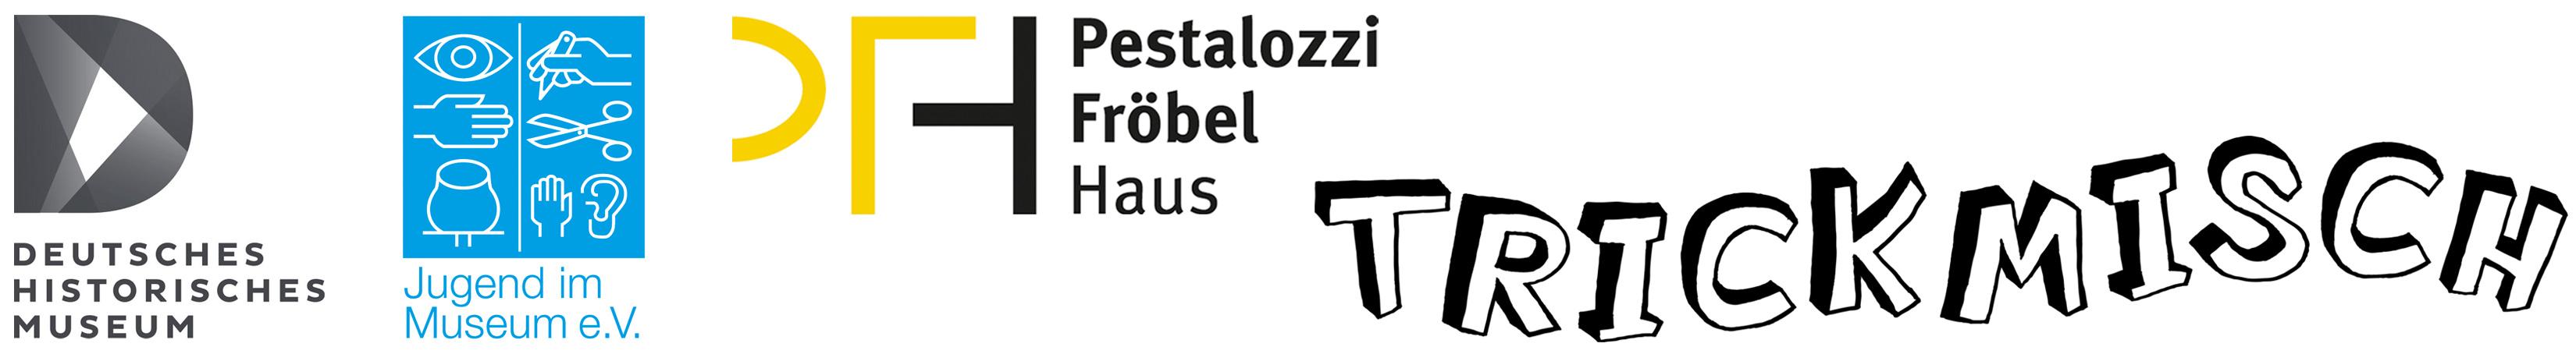 Logoleiste Zeitreisen